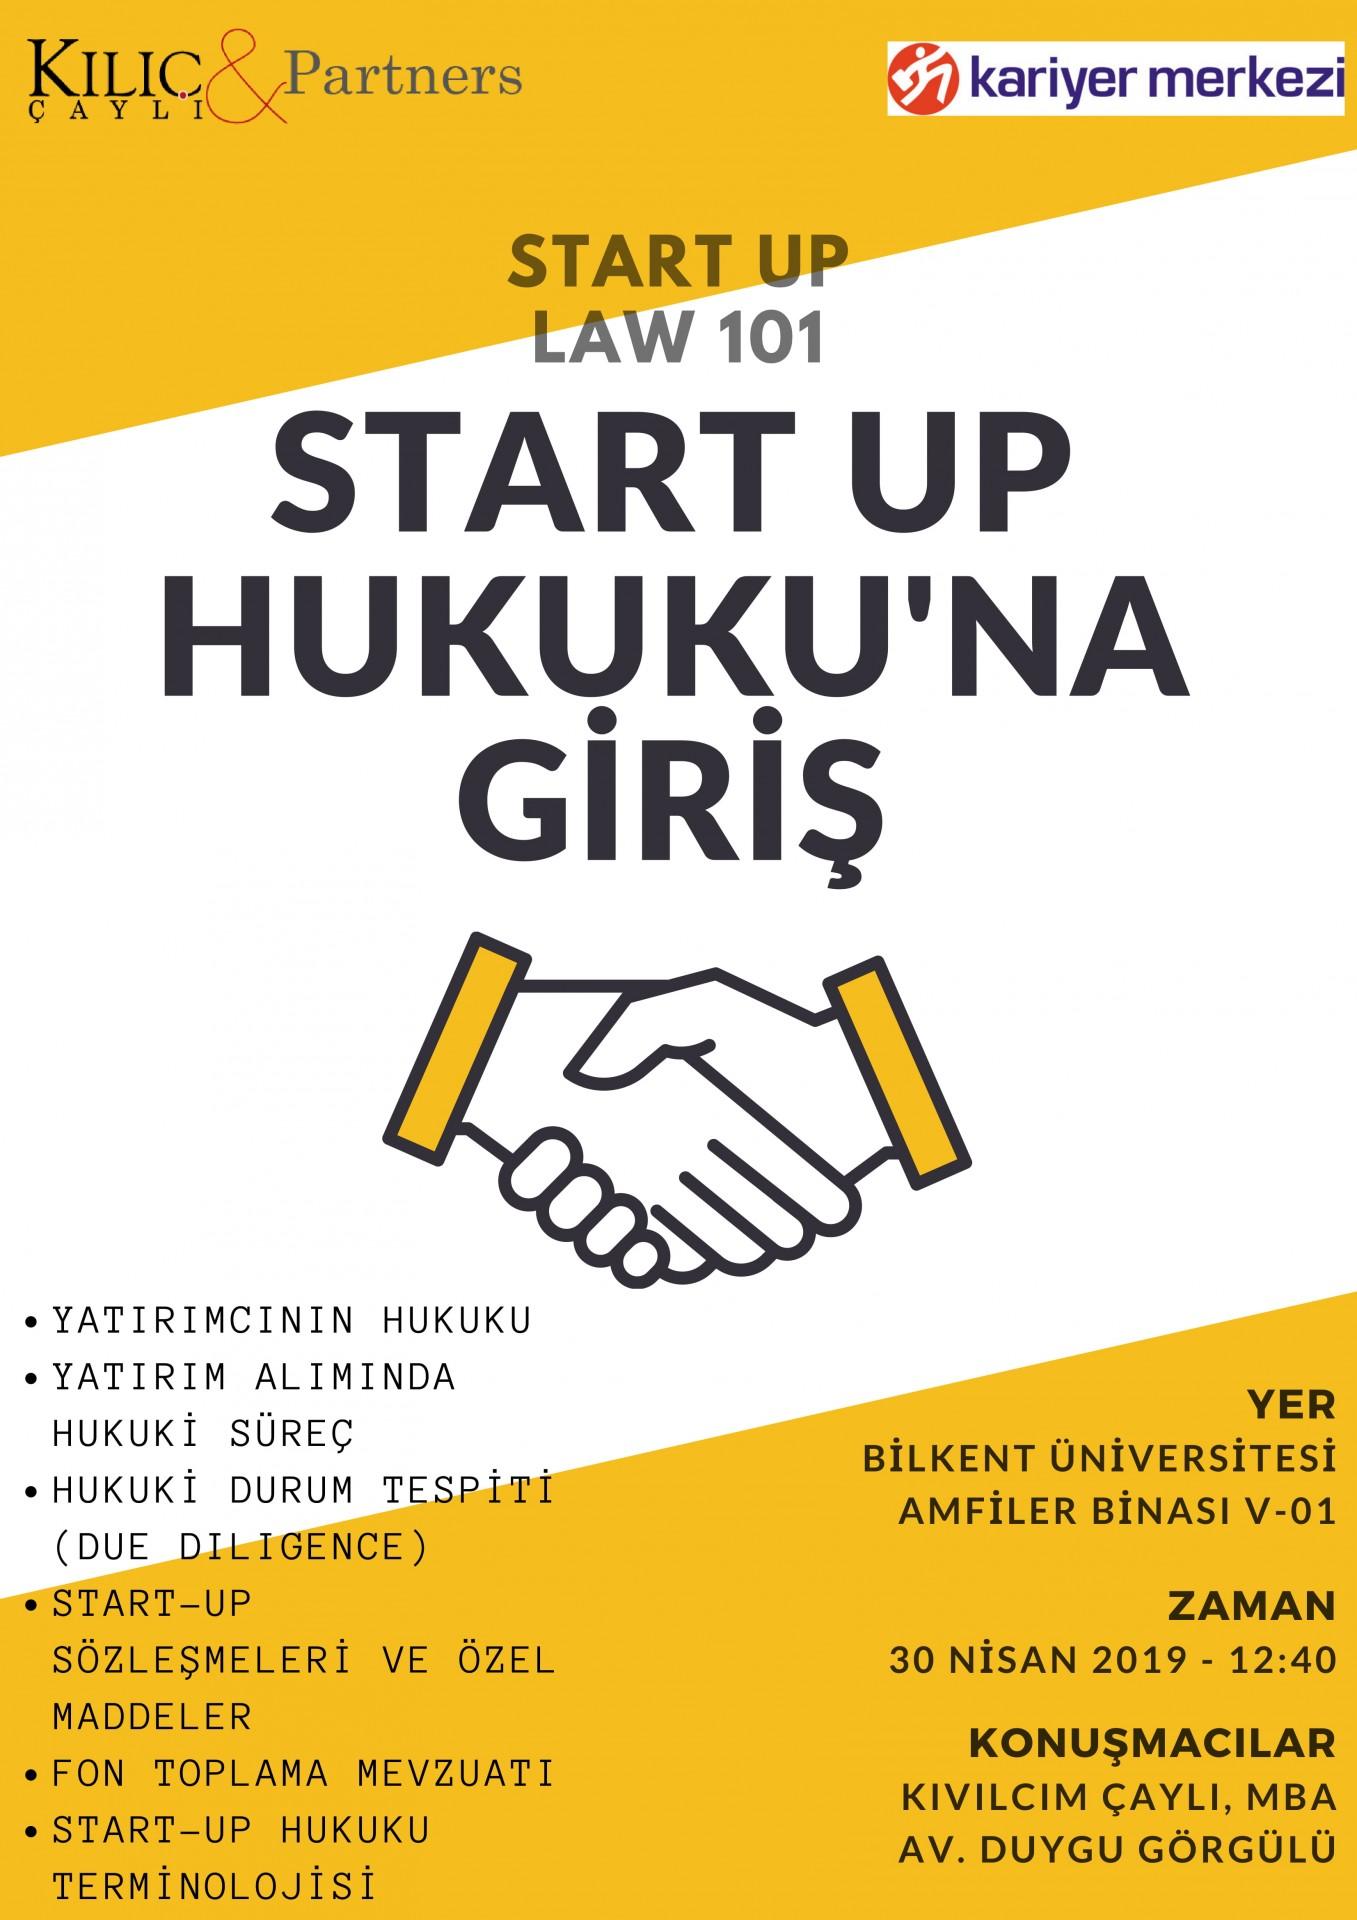 START UP HUKUKU'NA GİRİŞ- KILIÇ ÇAYLI & PARTNERS 1